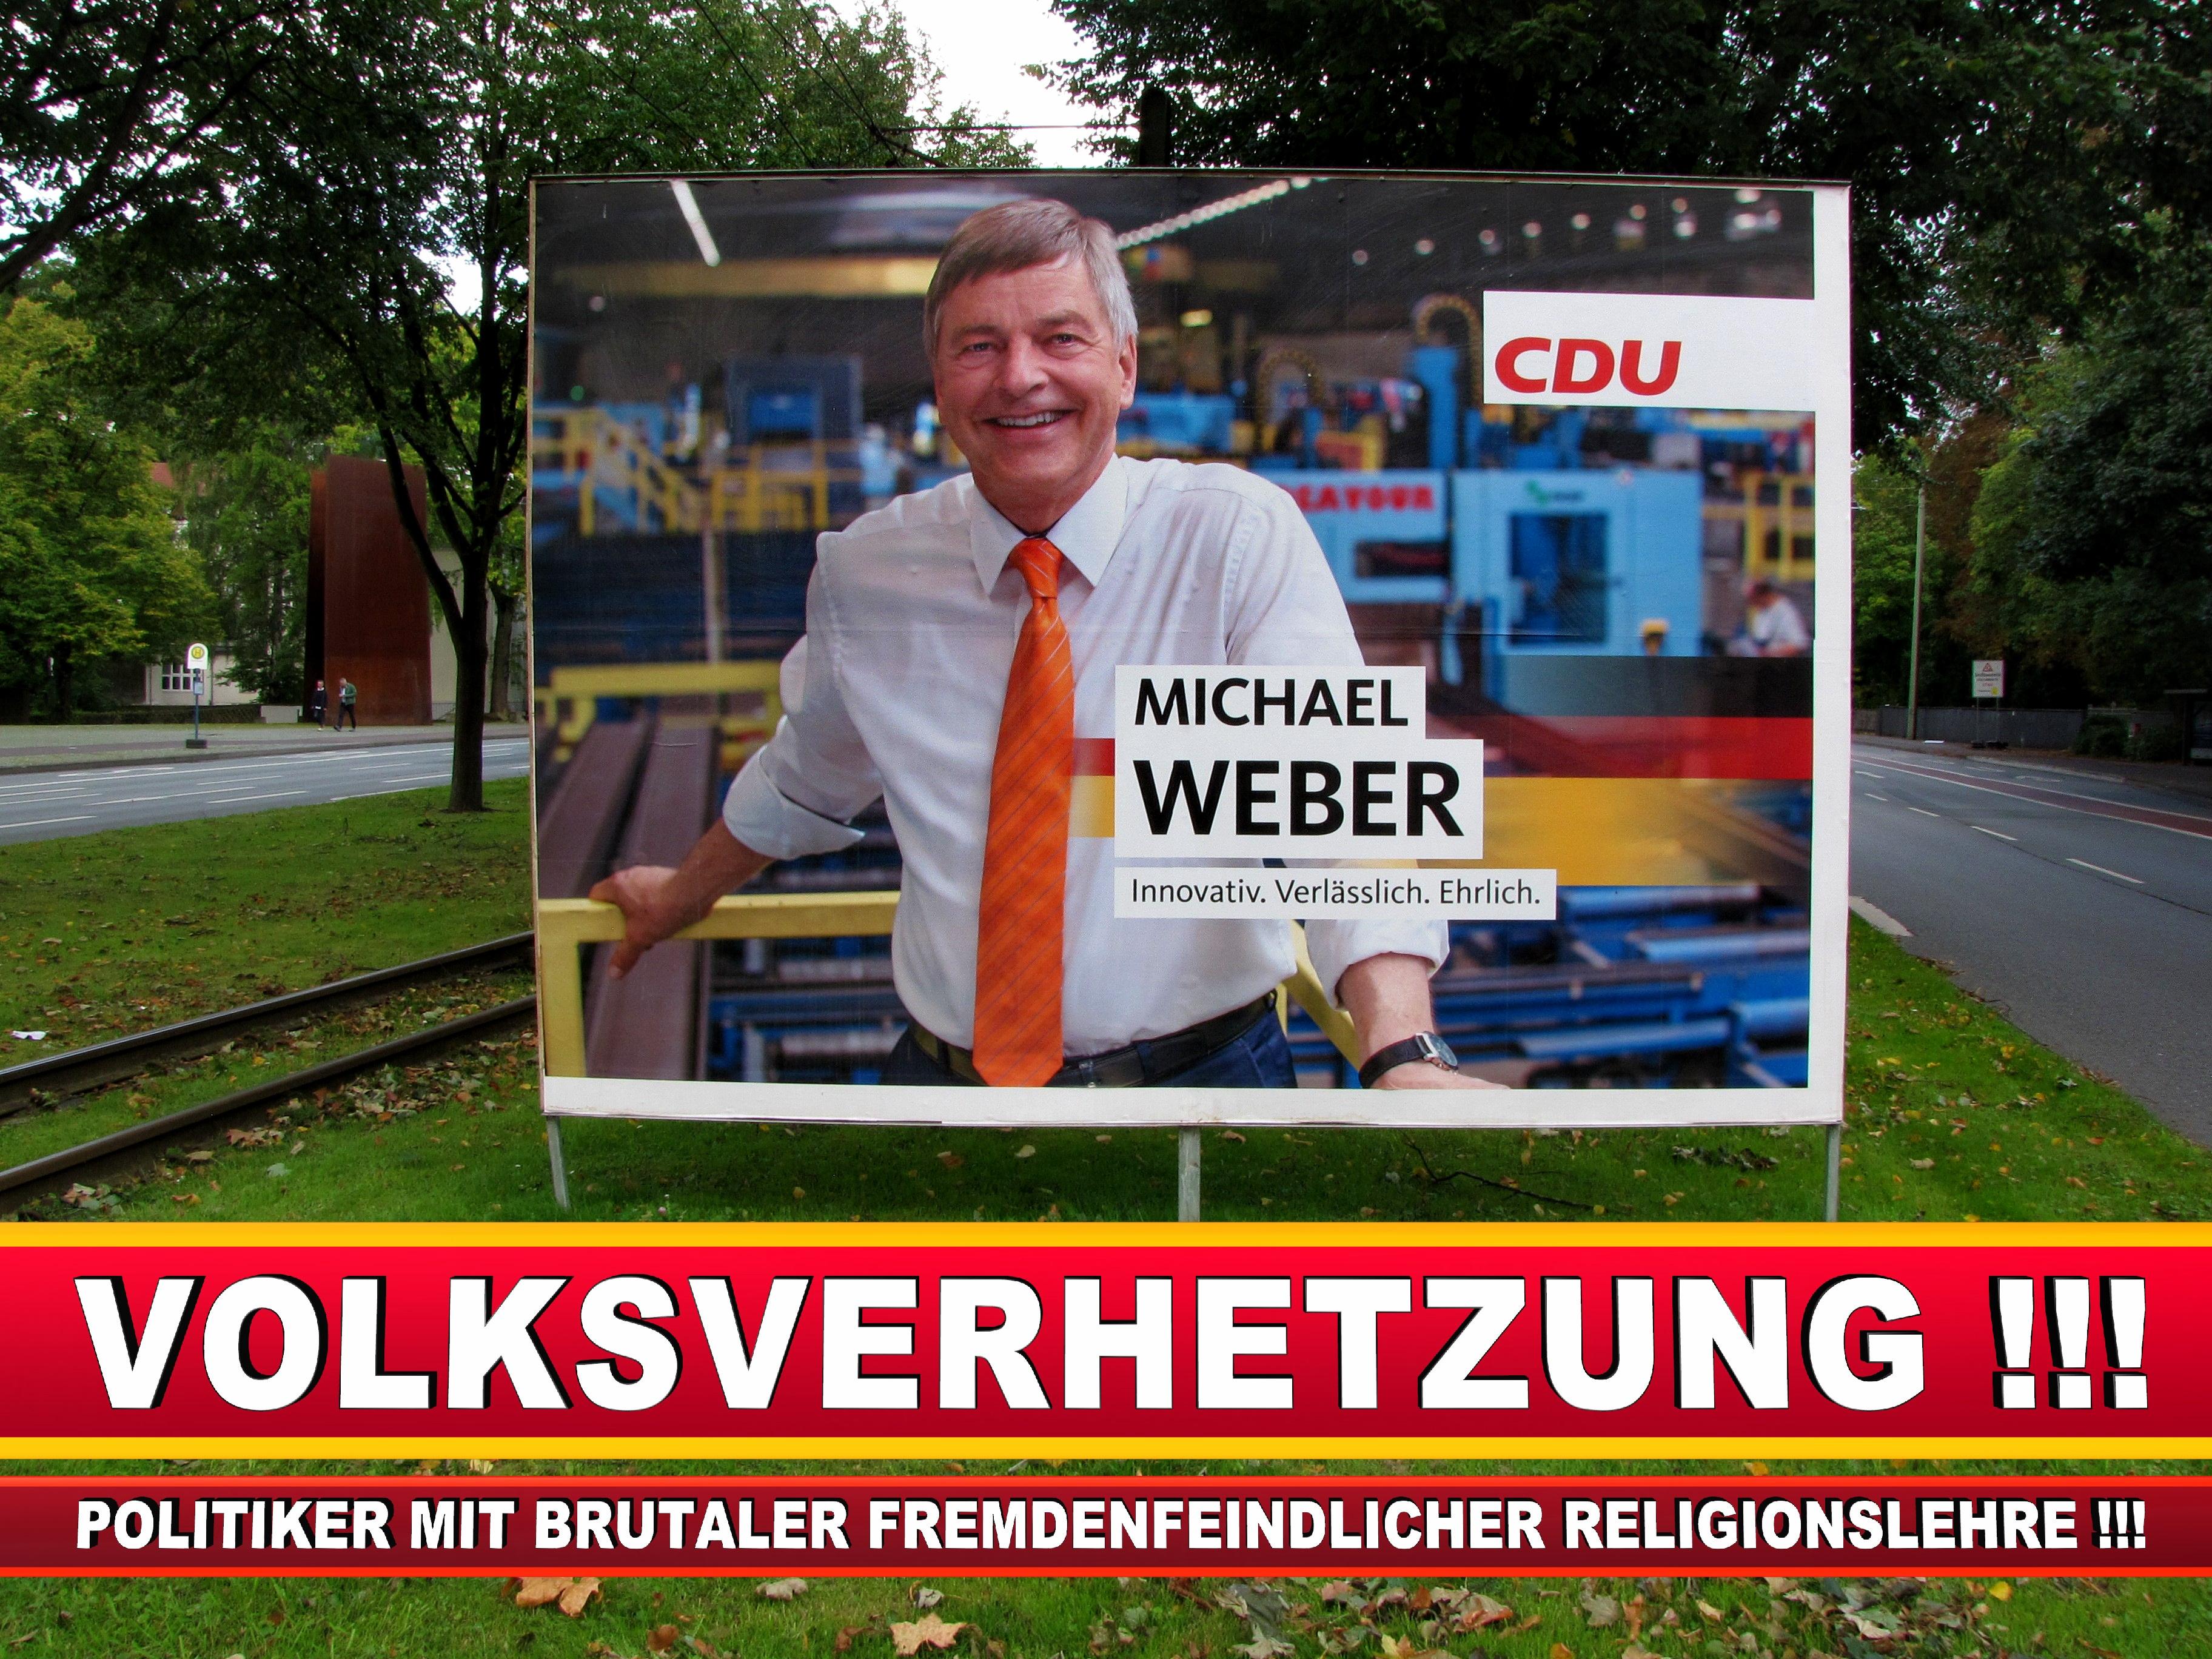 Michael Weber CDU Wahlplakat Wahlwerbung Bielefeld Volksverhetzung Durch Religion (4)